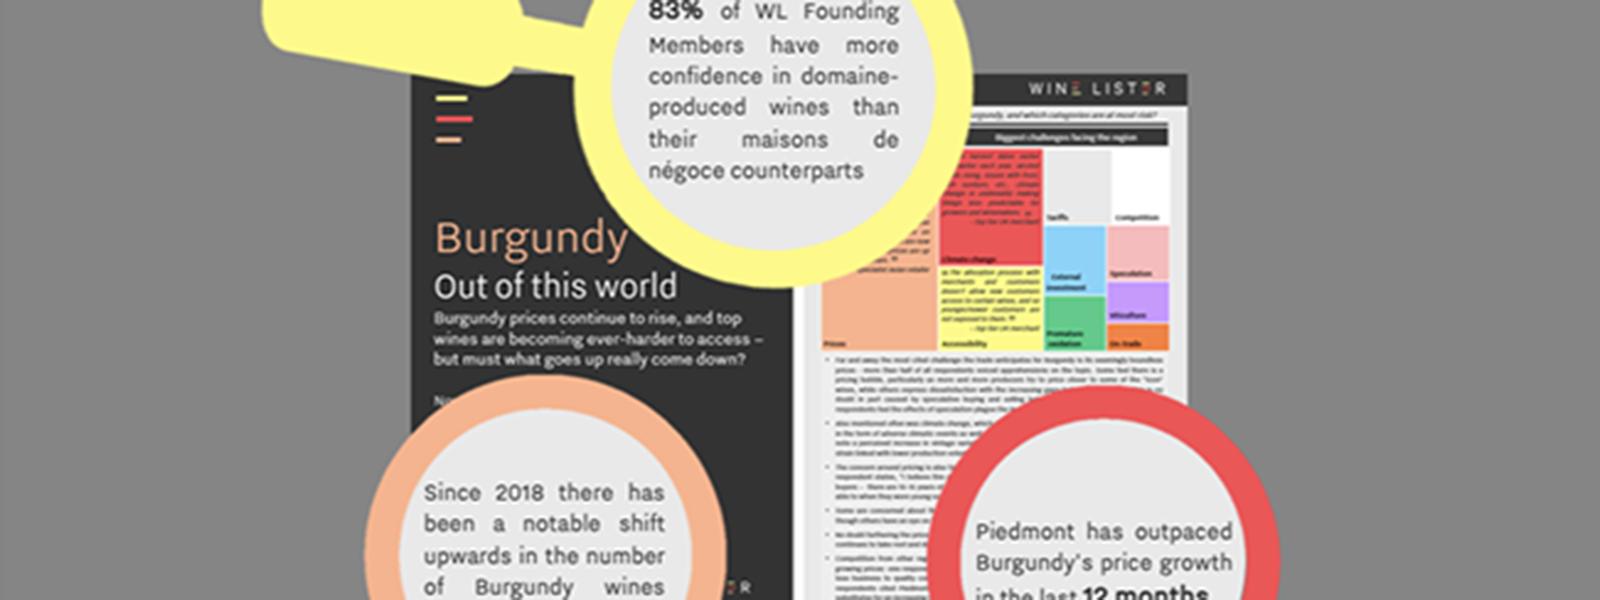 Wine Lister's 2020 Burgundy Study